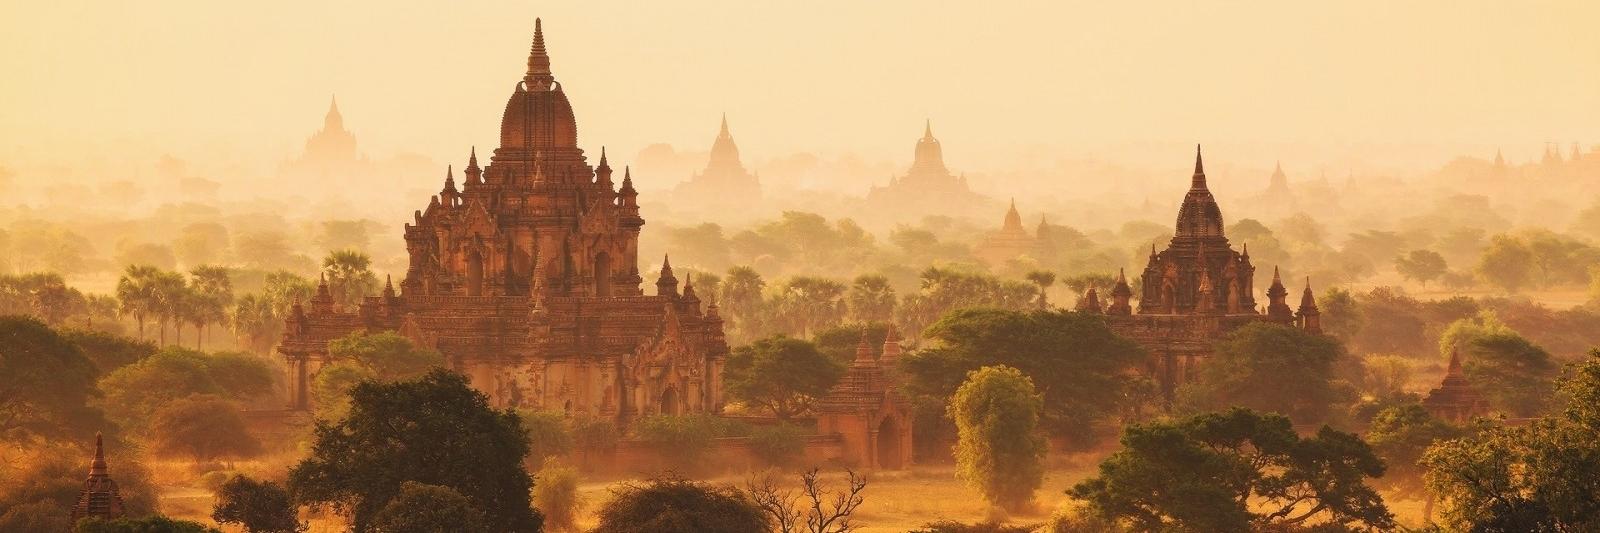 https://gody.vn/blog/du-lich-chau-a/post/myanmar-hanh-trinh-di-tim-ban-chat-cuoc-song-1288